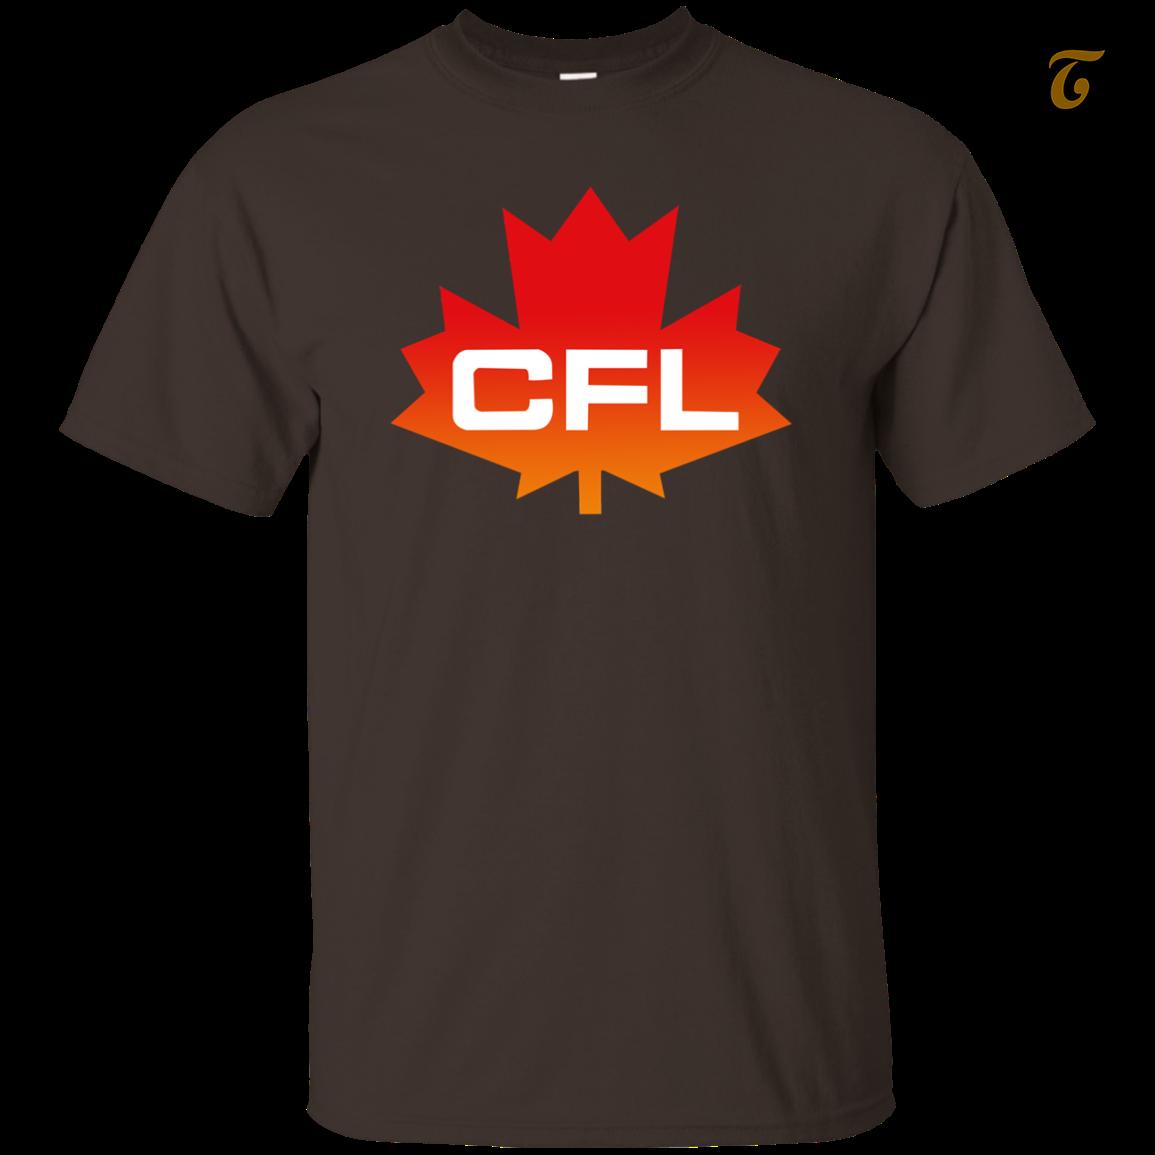 Cfl  logo  canadian  football  league  men s t shirt   dark chocolate